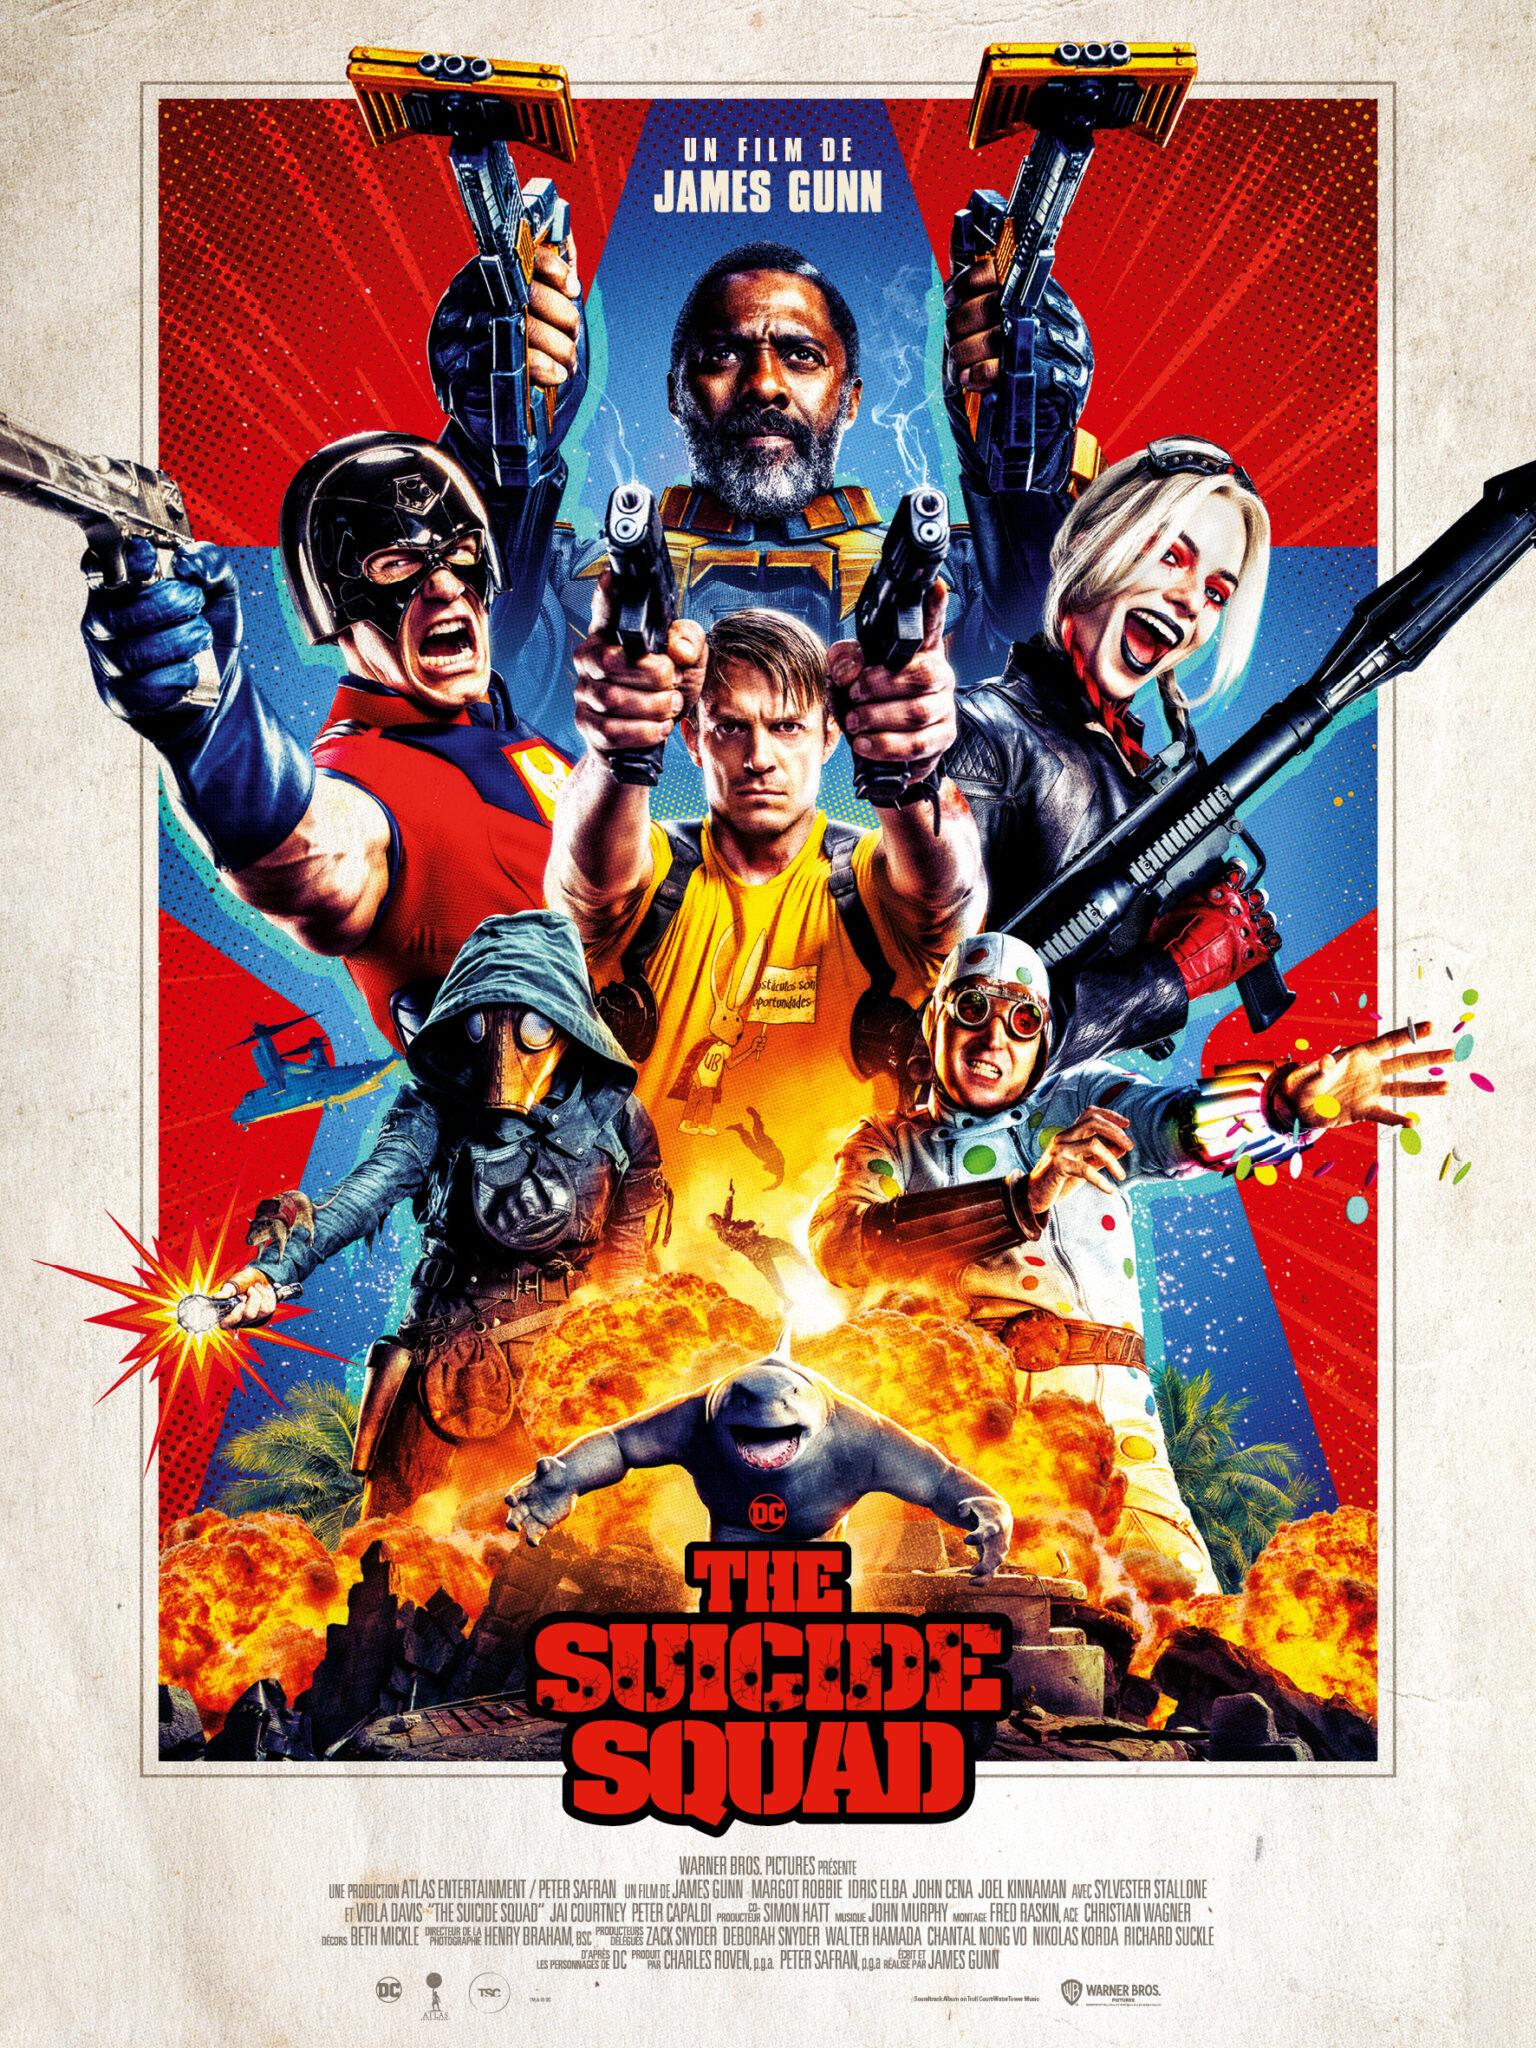 THE SUICIDE SQUAD AFFICHE film 2021